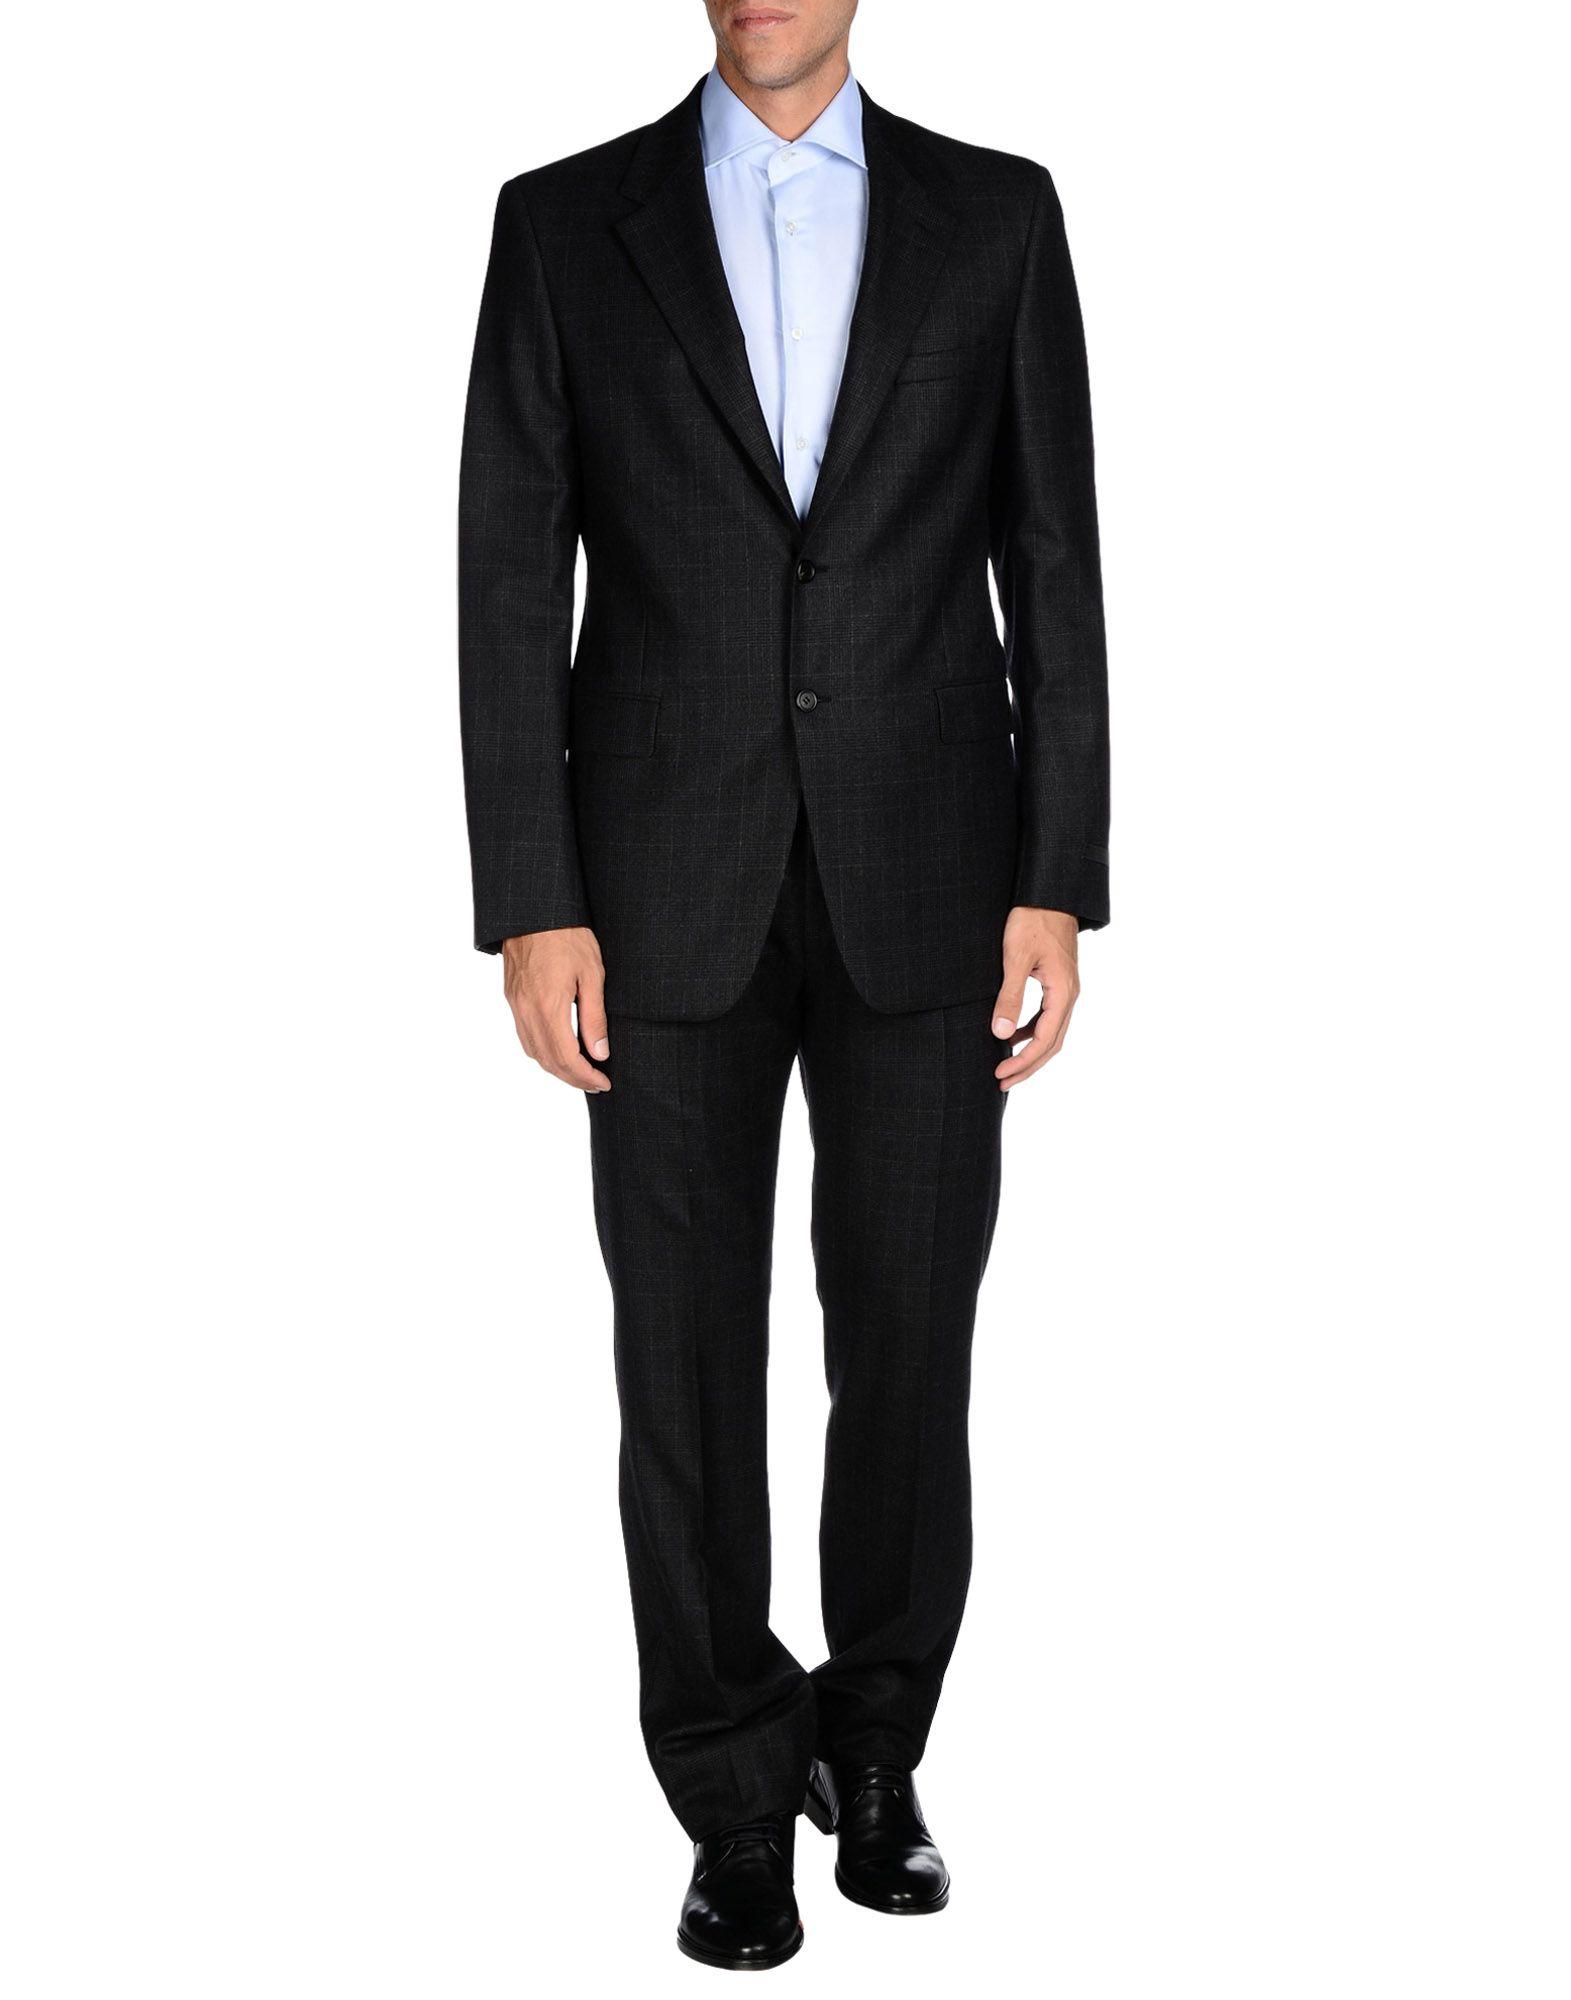 Prada Mens Suits 49